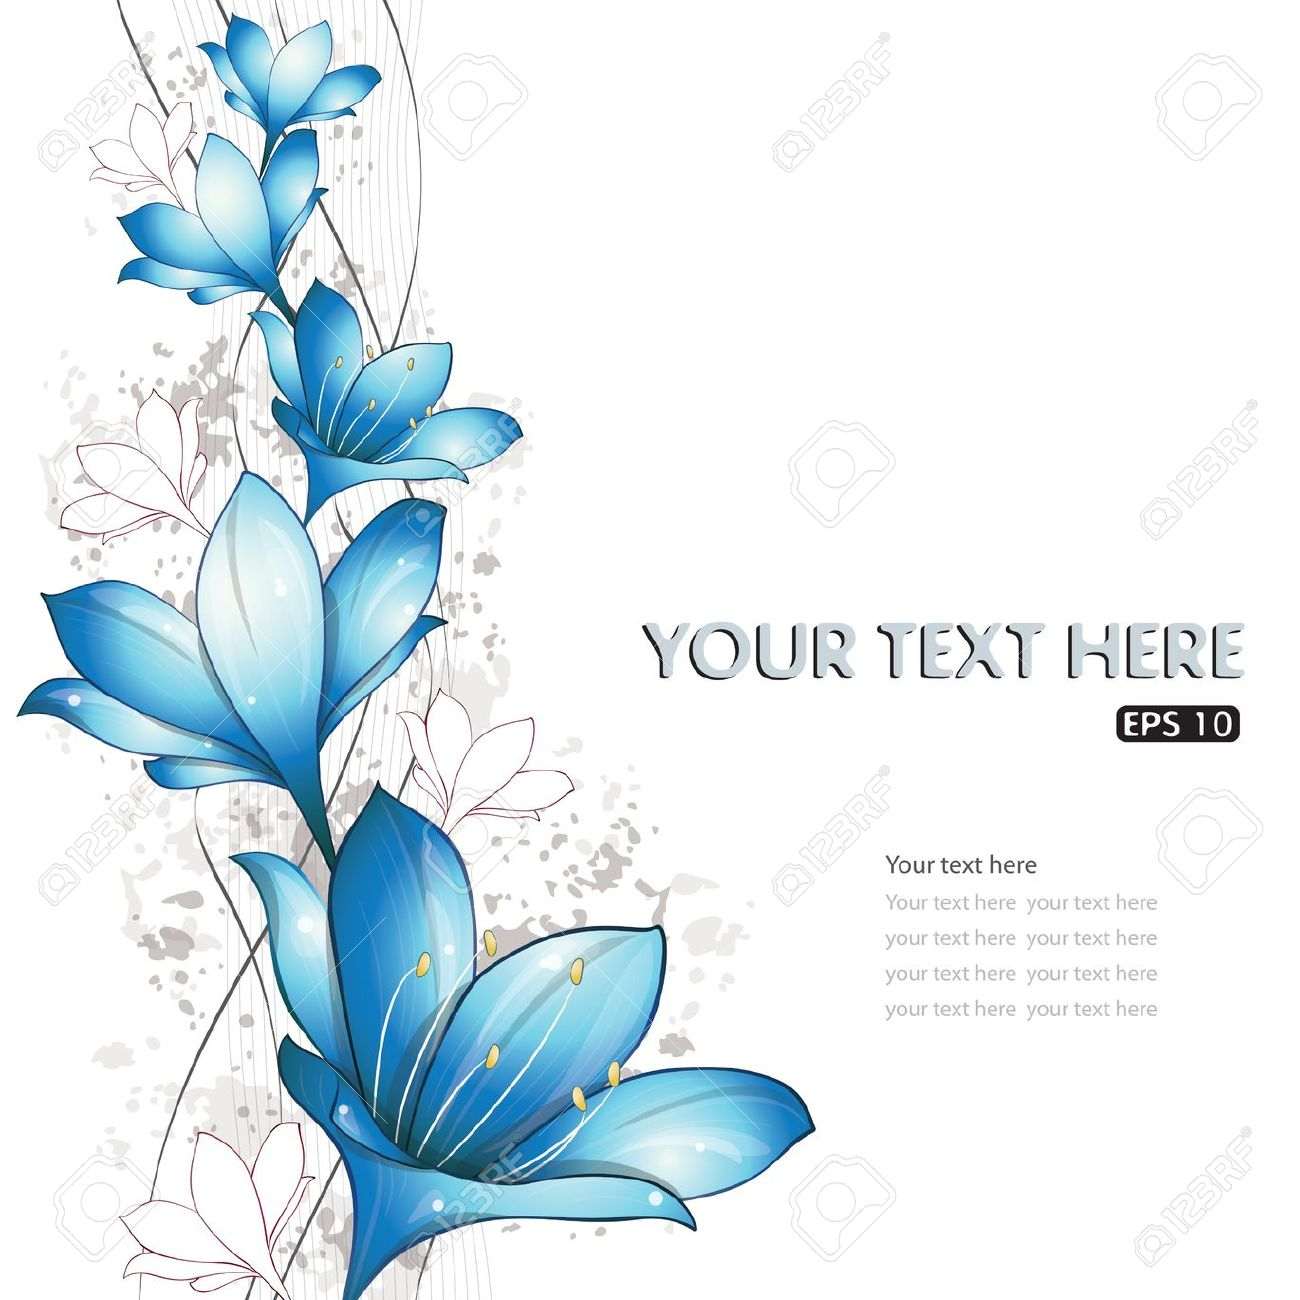 Blue Lilies Design, Vector Illustration, Eps.